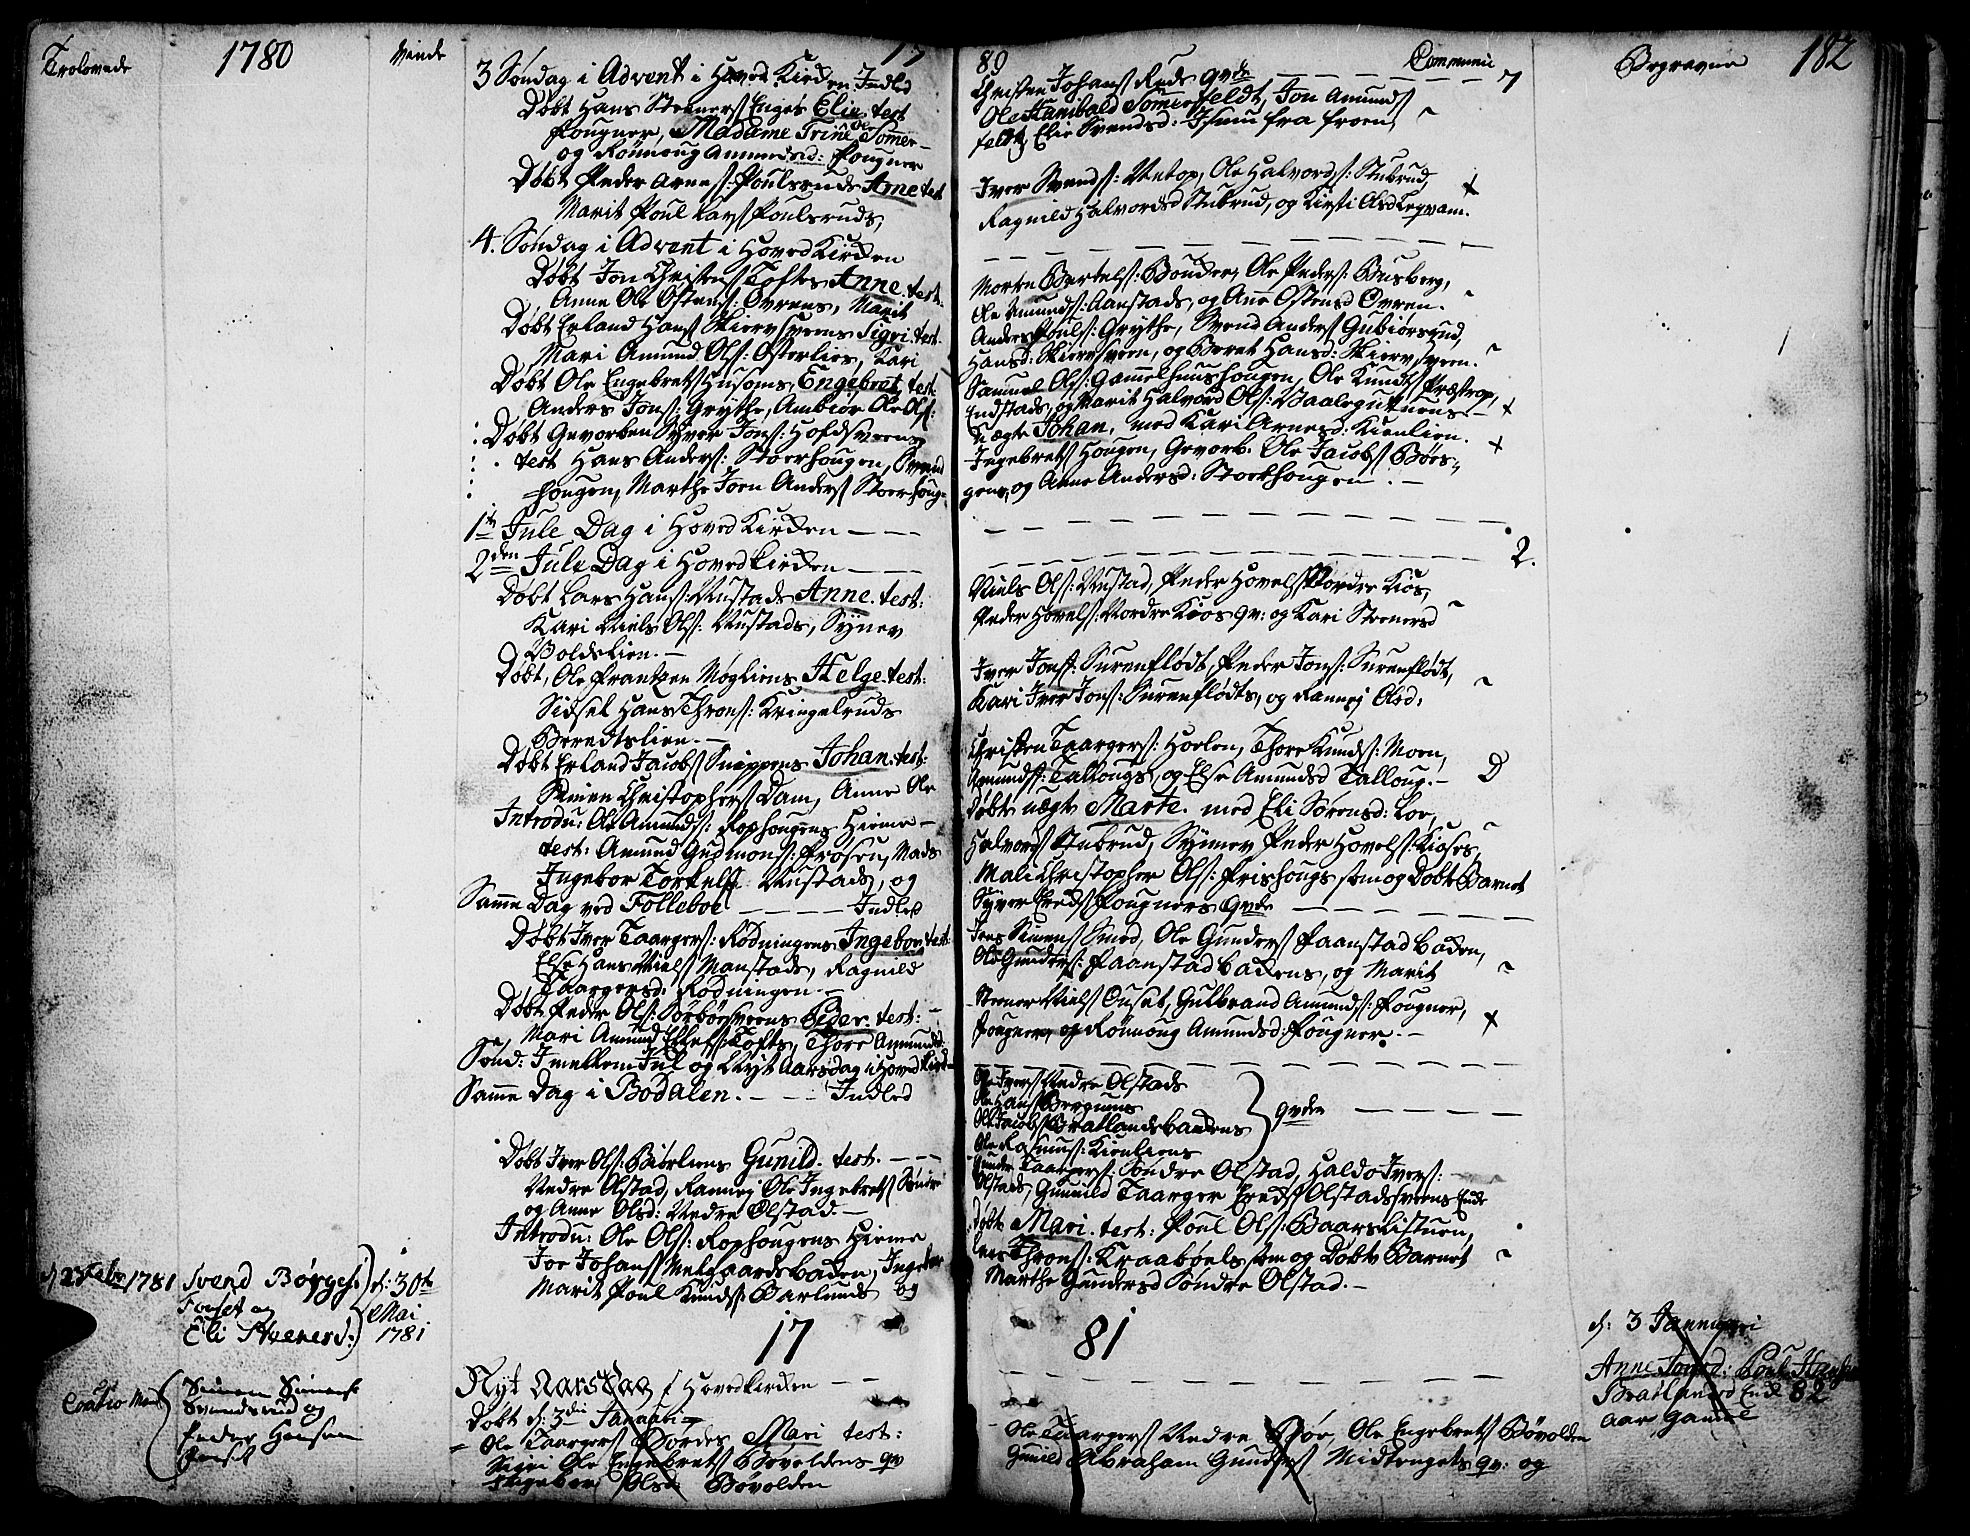 SAH, Gausdal prestekontor, Ministerialbok nr. 3, 1758-1809, s. 182